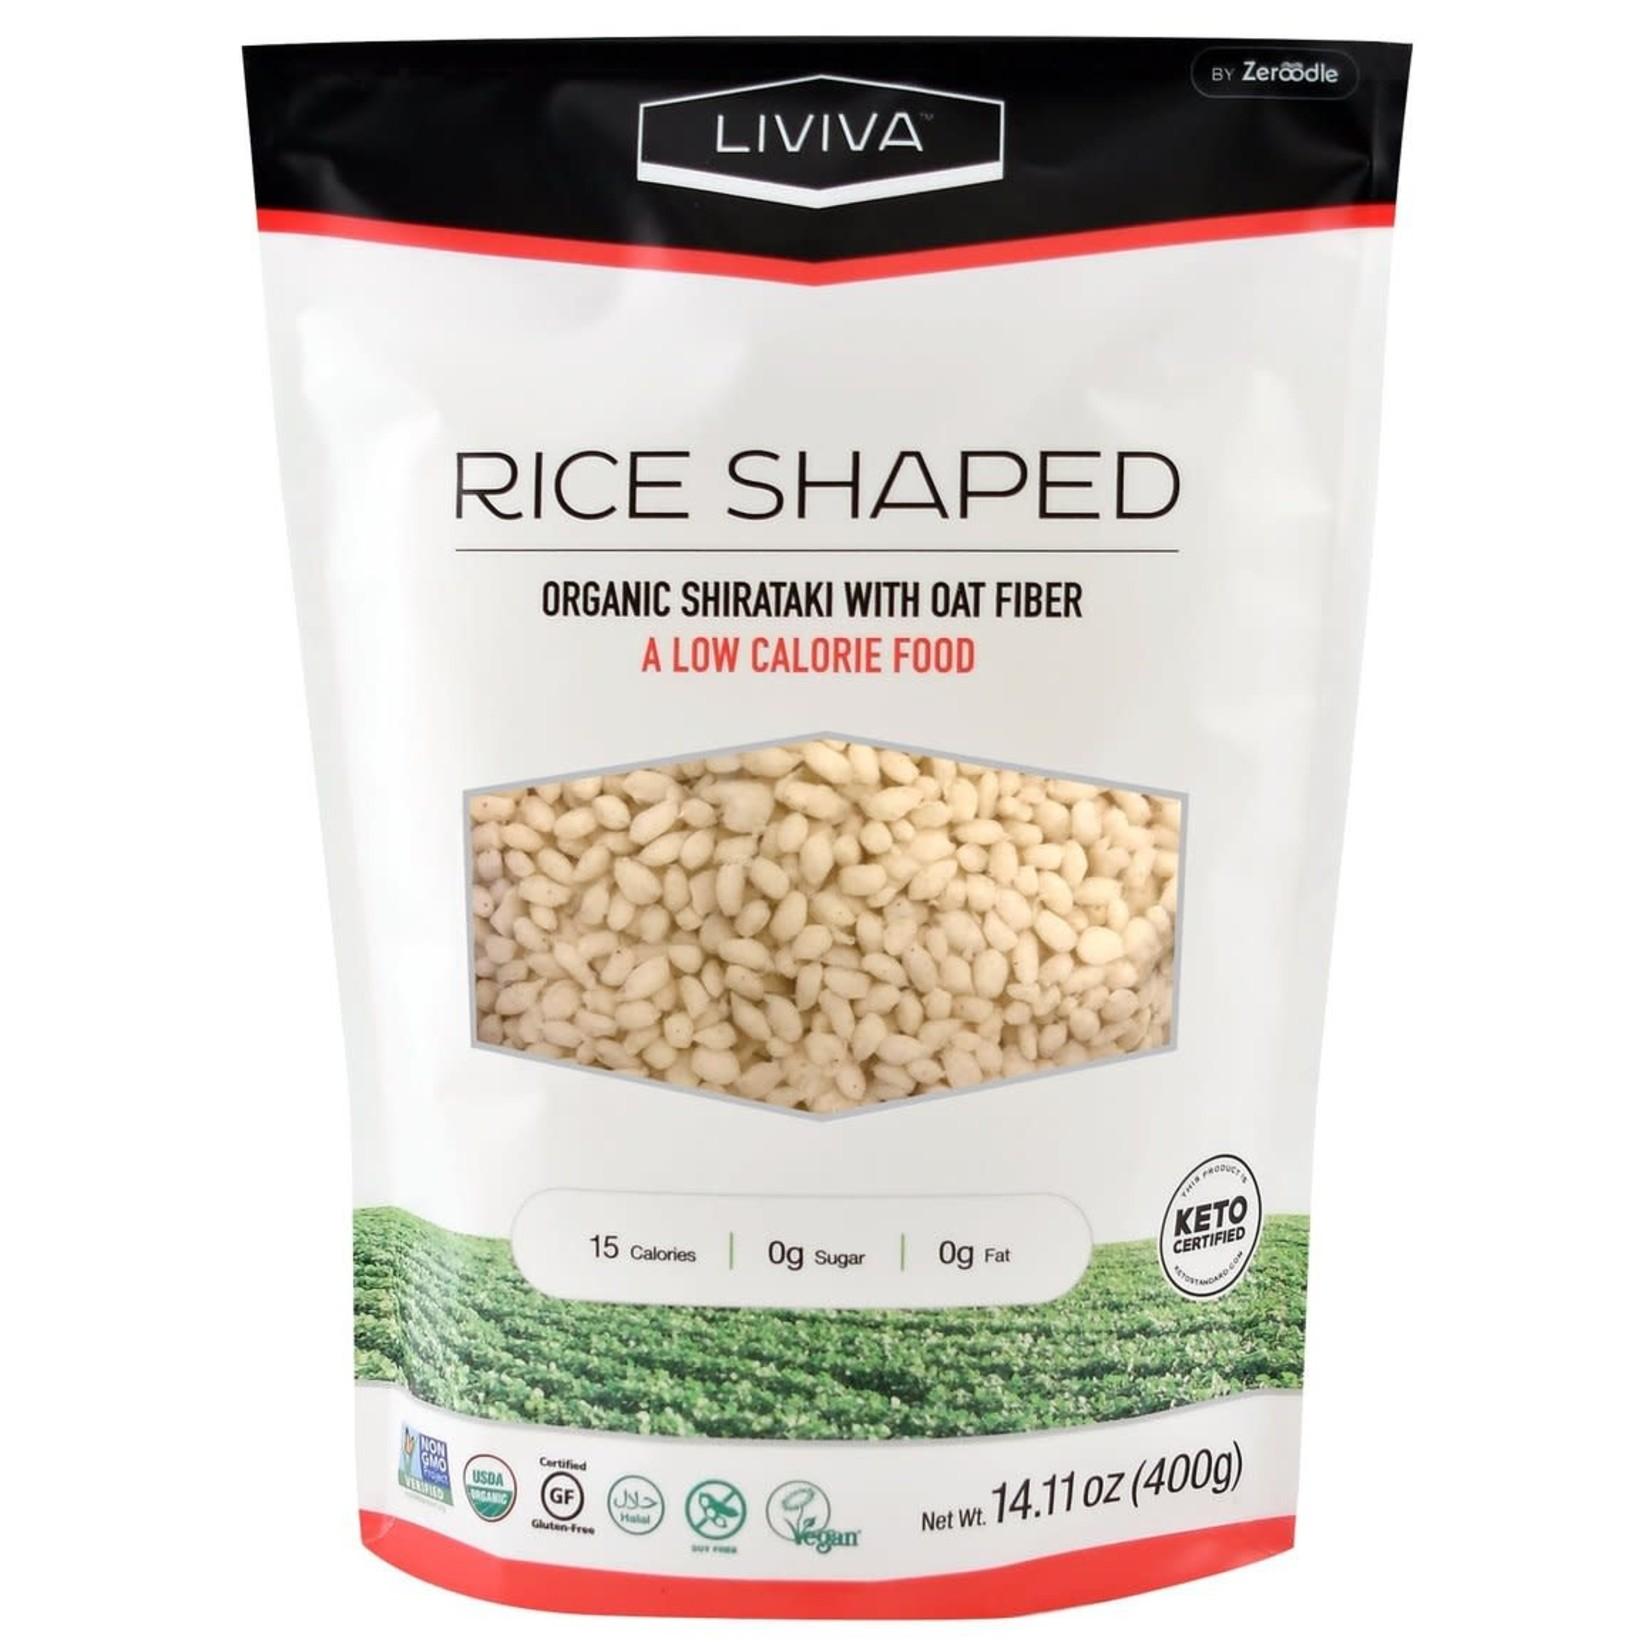 Liviva Liviva Shirataki Rice Shaped with Oat Fiber